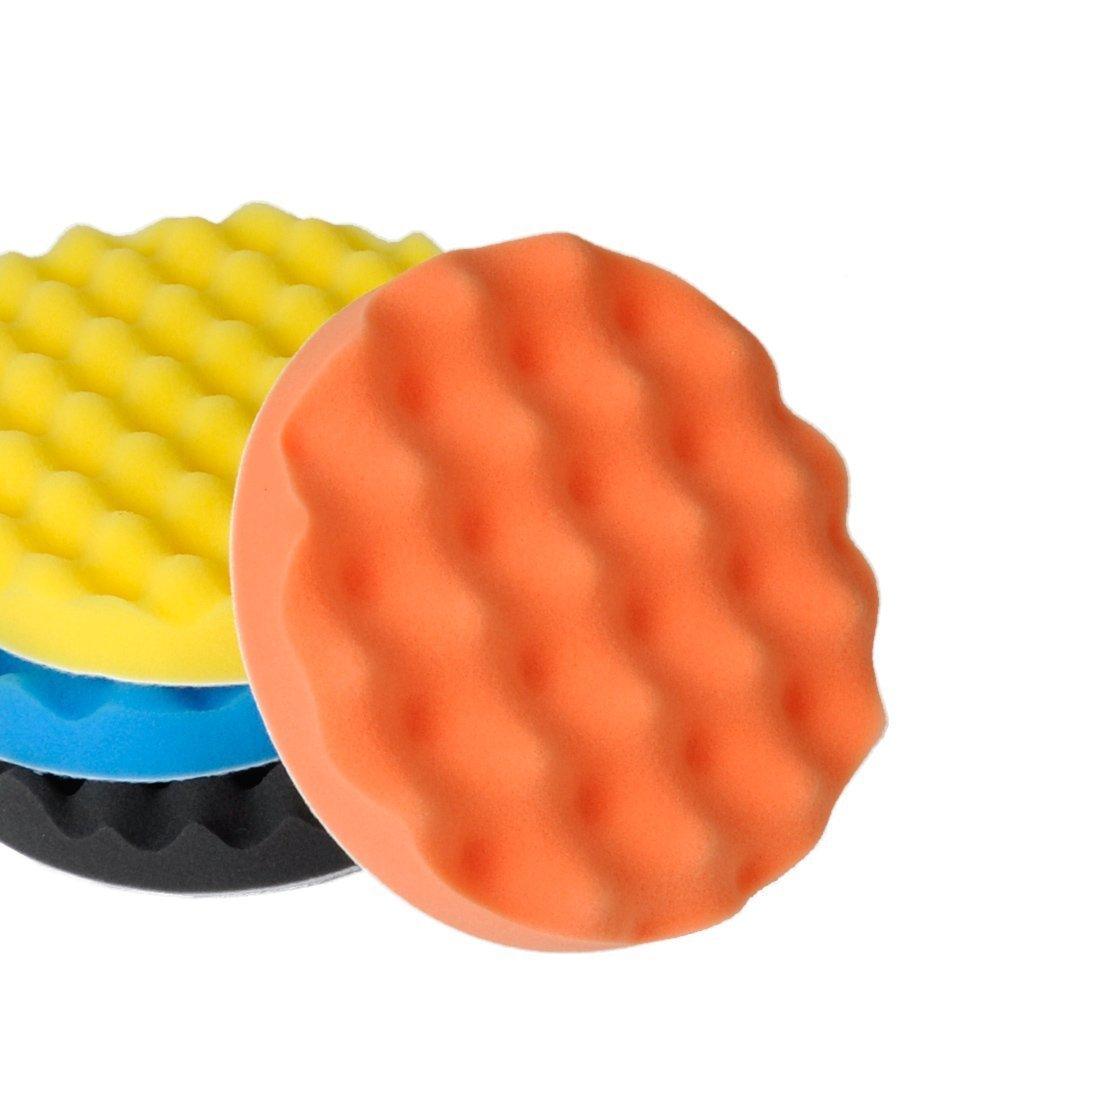 SHINA 4Pcs 7 inch Buffing Polishing Sponge Pads Kit For Car Polisher Buffer by SHINA (Image #4)